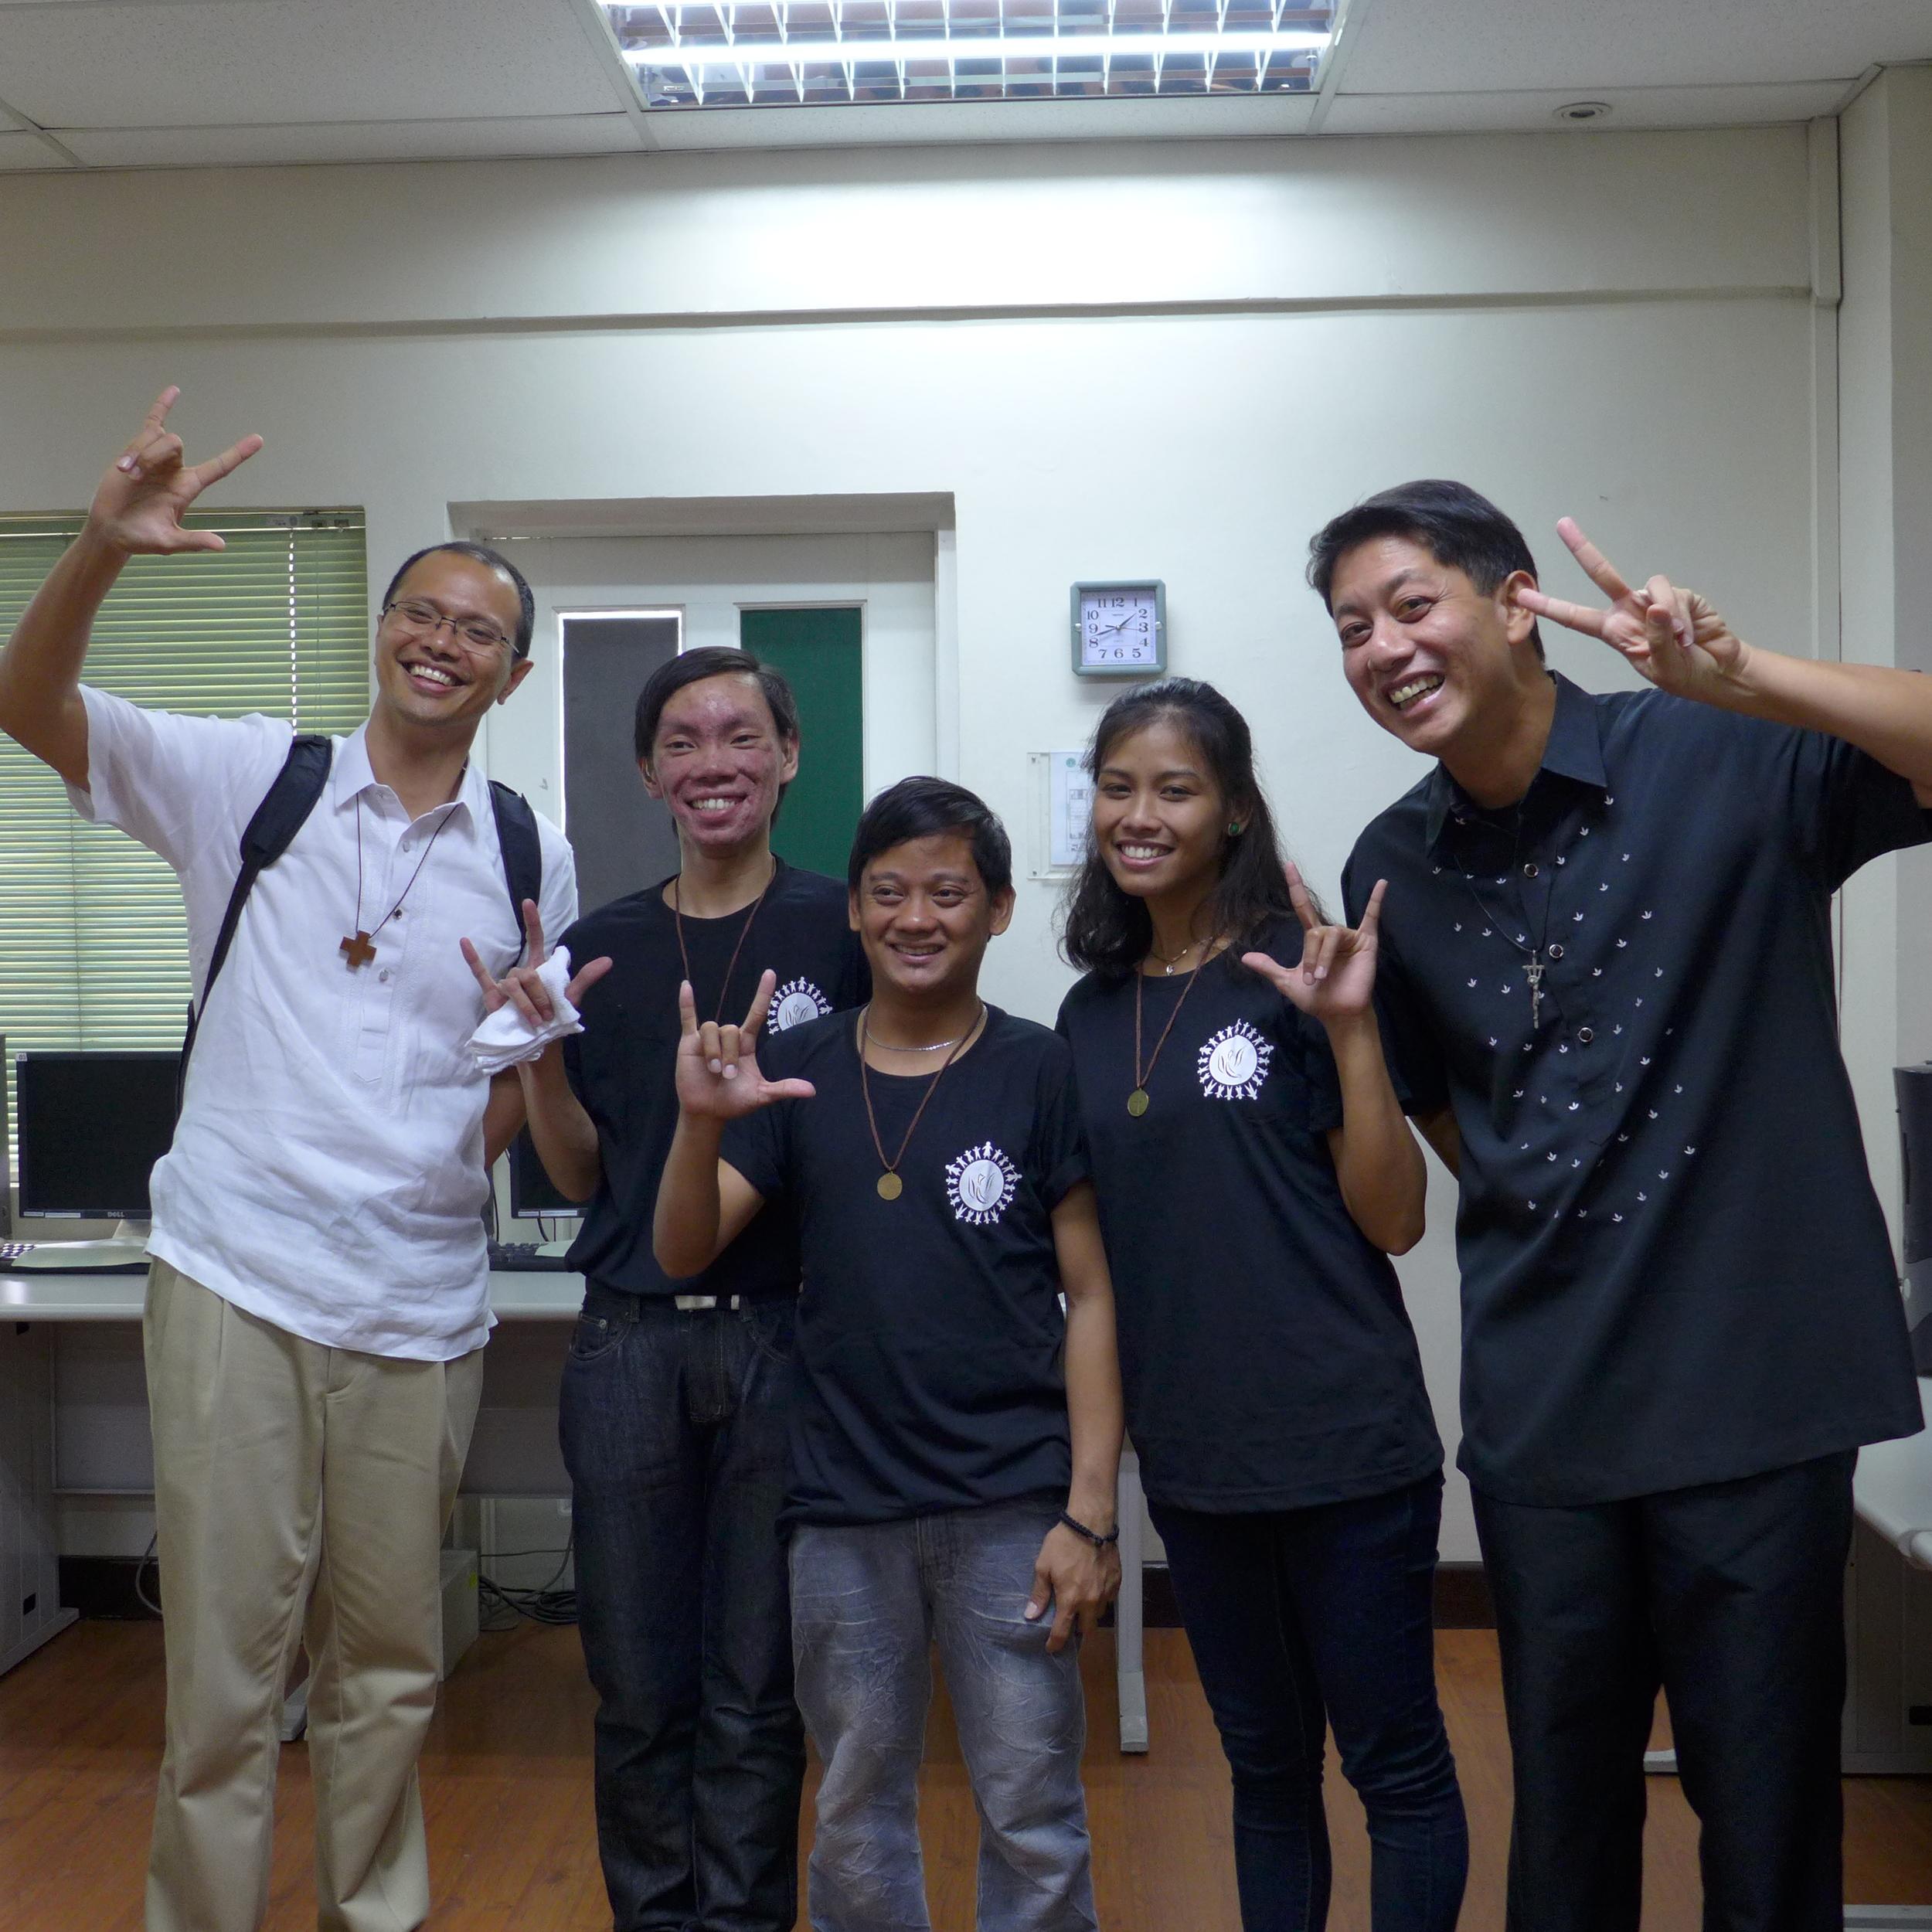 Photo courtesy of Br. JJ Jimenez FSC